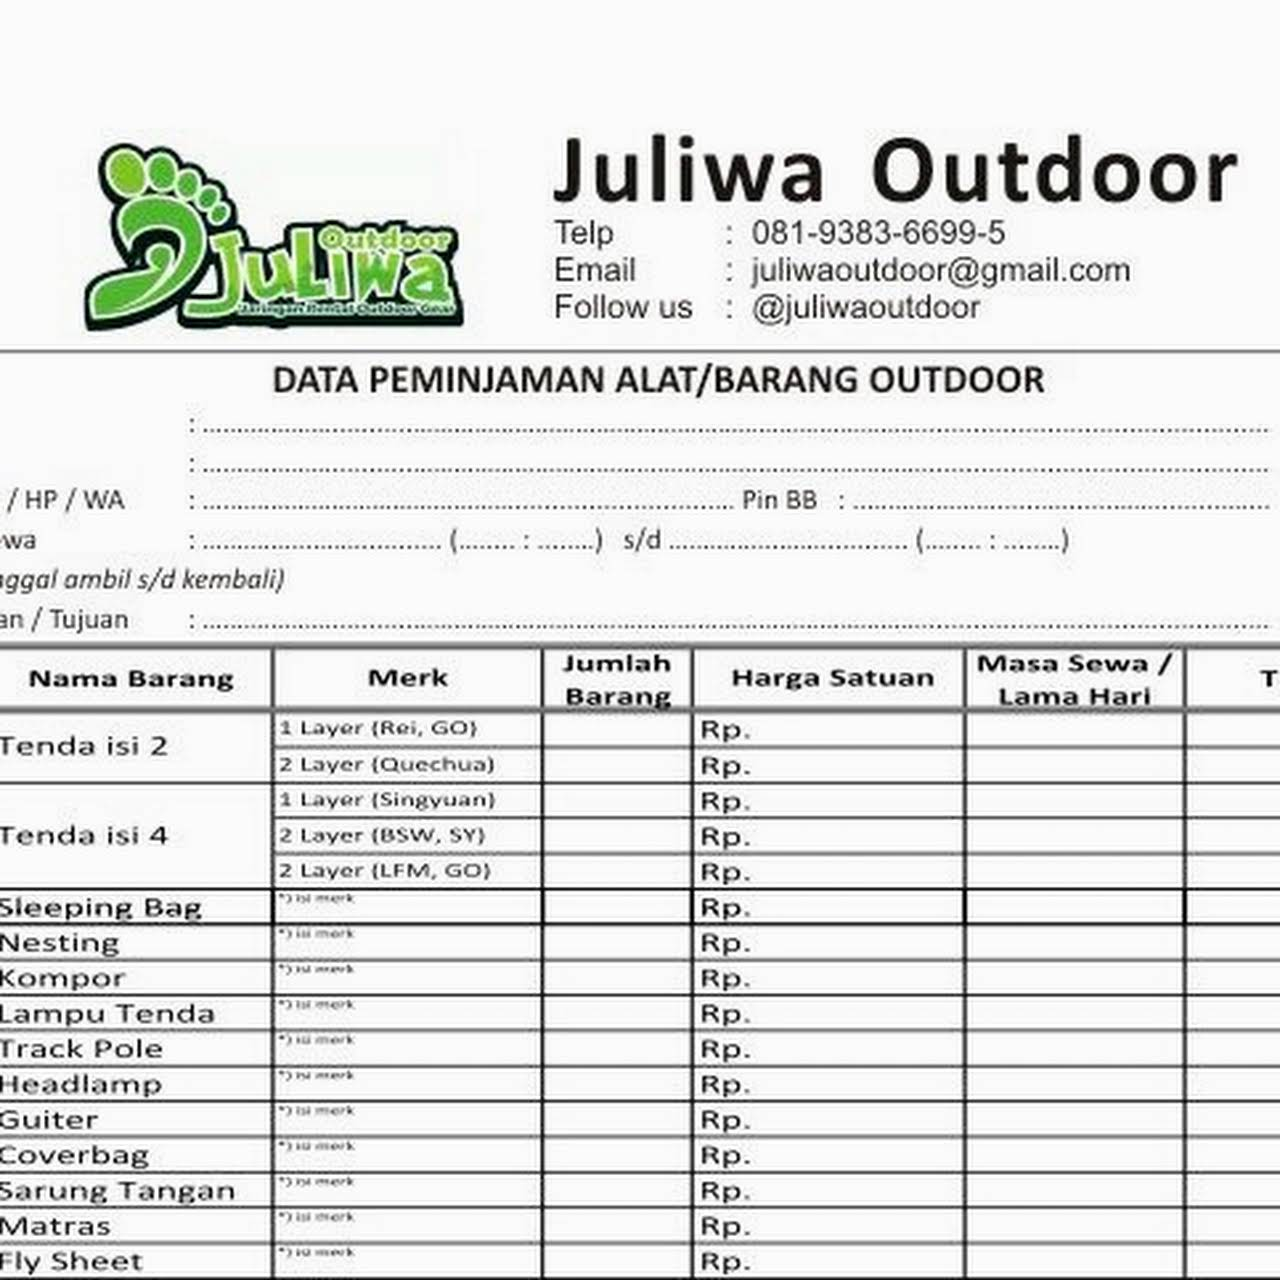 Juliwa Outdoor Surabaya Outdoor Rental Maintenance Service Juliwa Outdoor Surabaya Menyediakan Rental Alat Camping Dan Melayani Maintenance Service Untuk Alat Camping Kalian Yang Rusak Ataupun Kotor